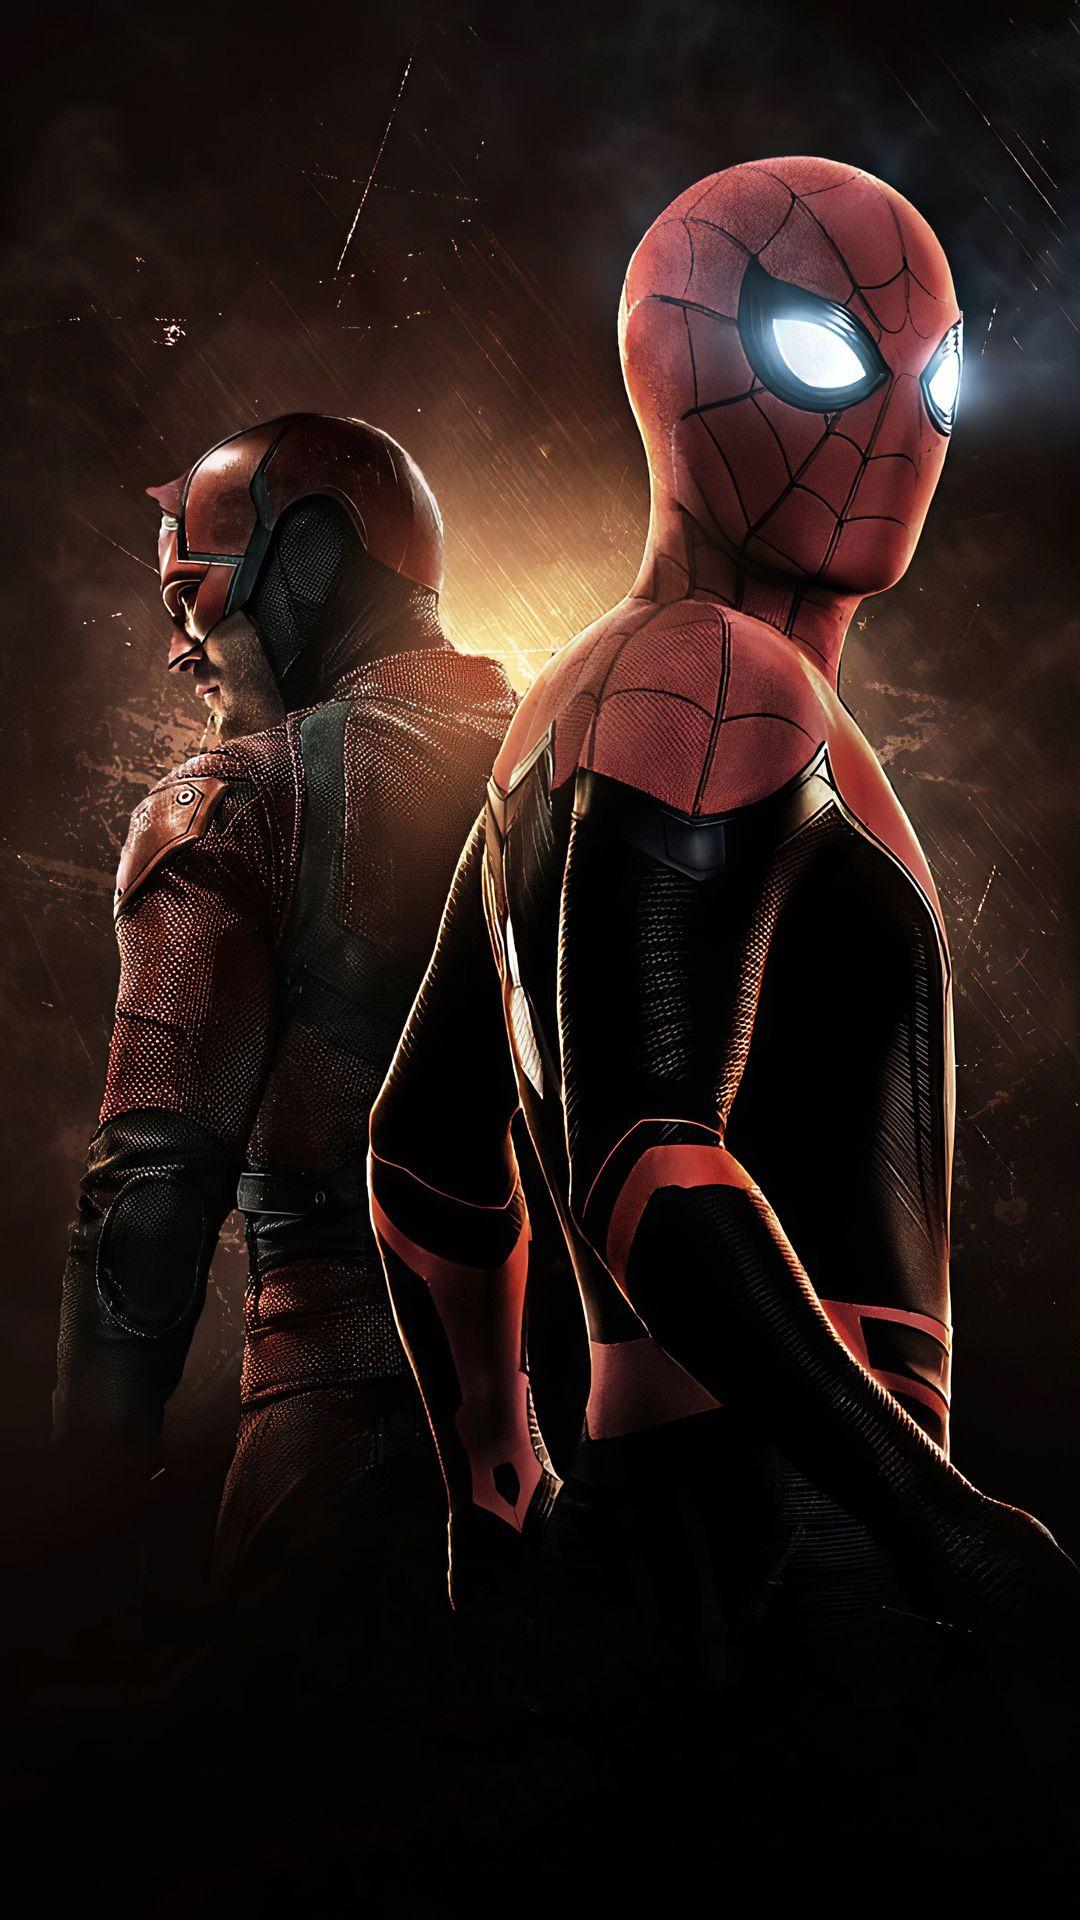 Spider Man And Daredevil 4k Wallpapers | hdqwalls.com